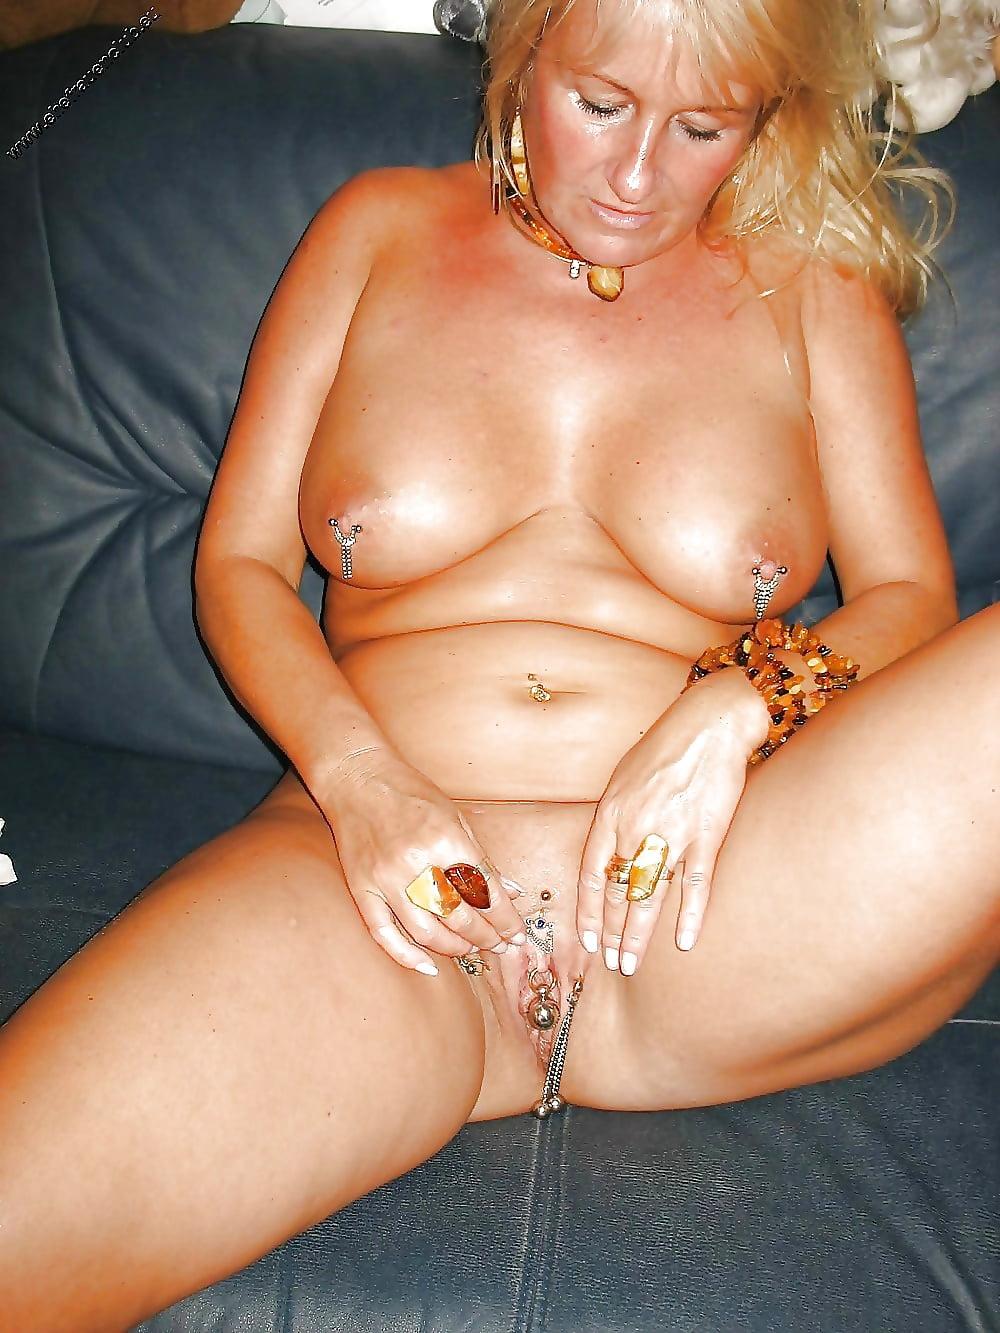 Female Naked Piercings